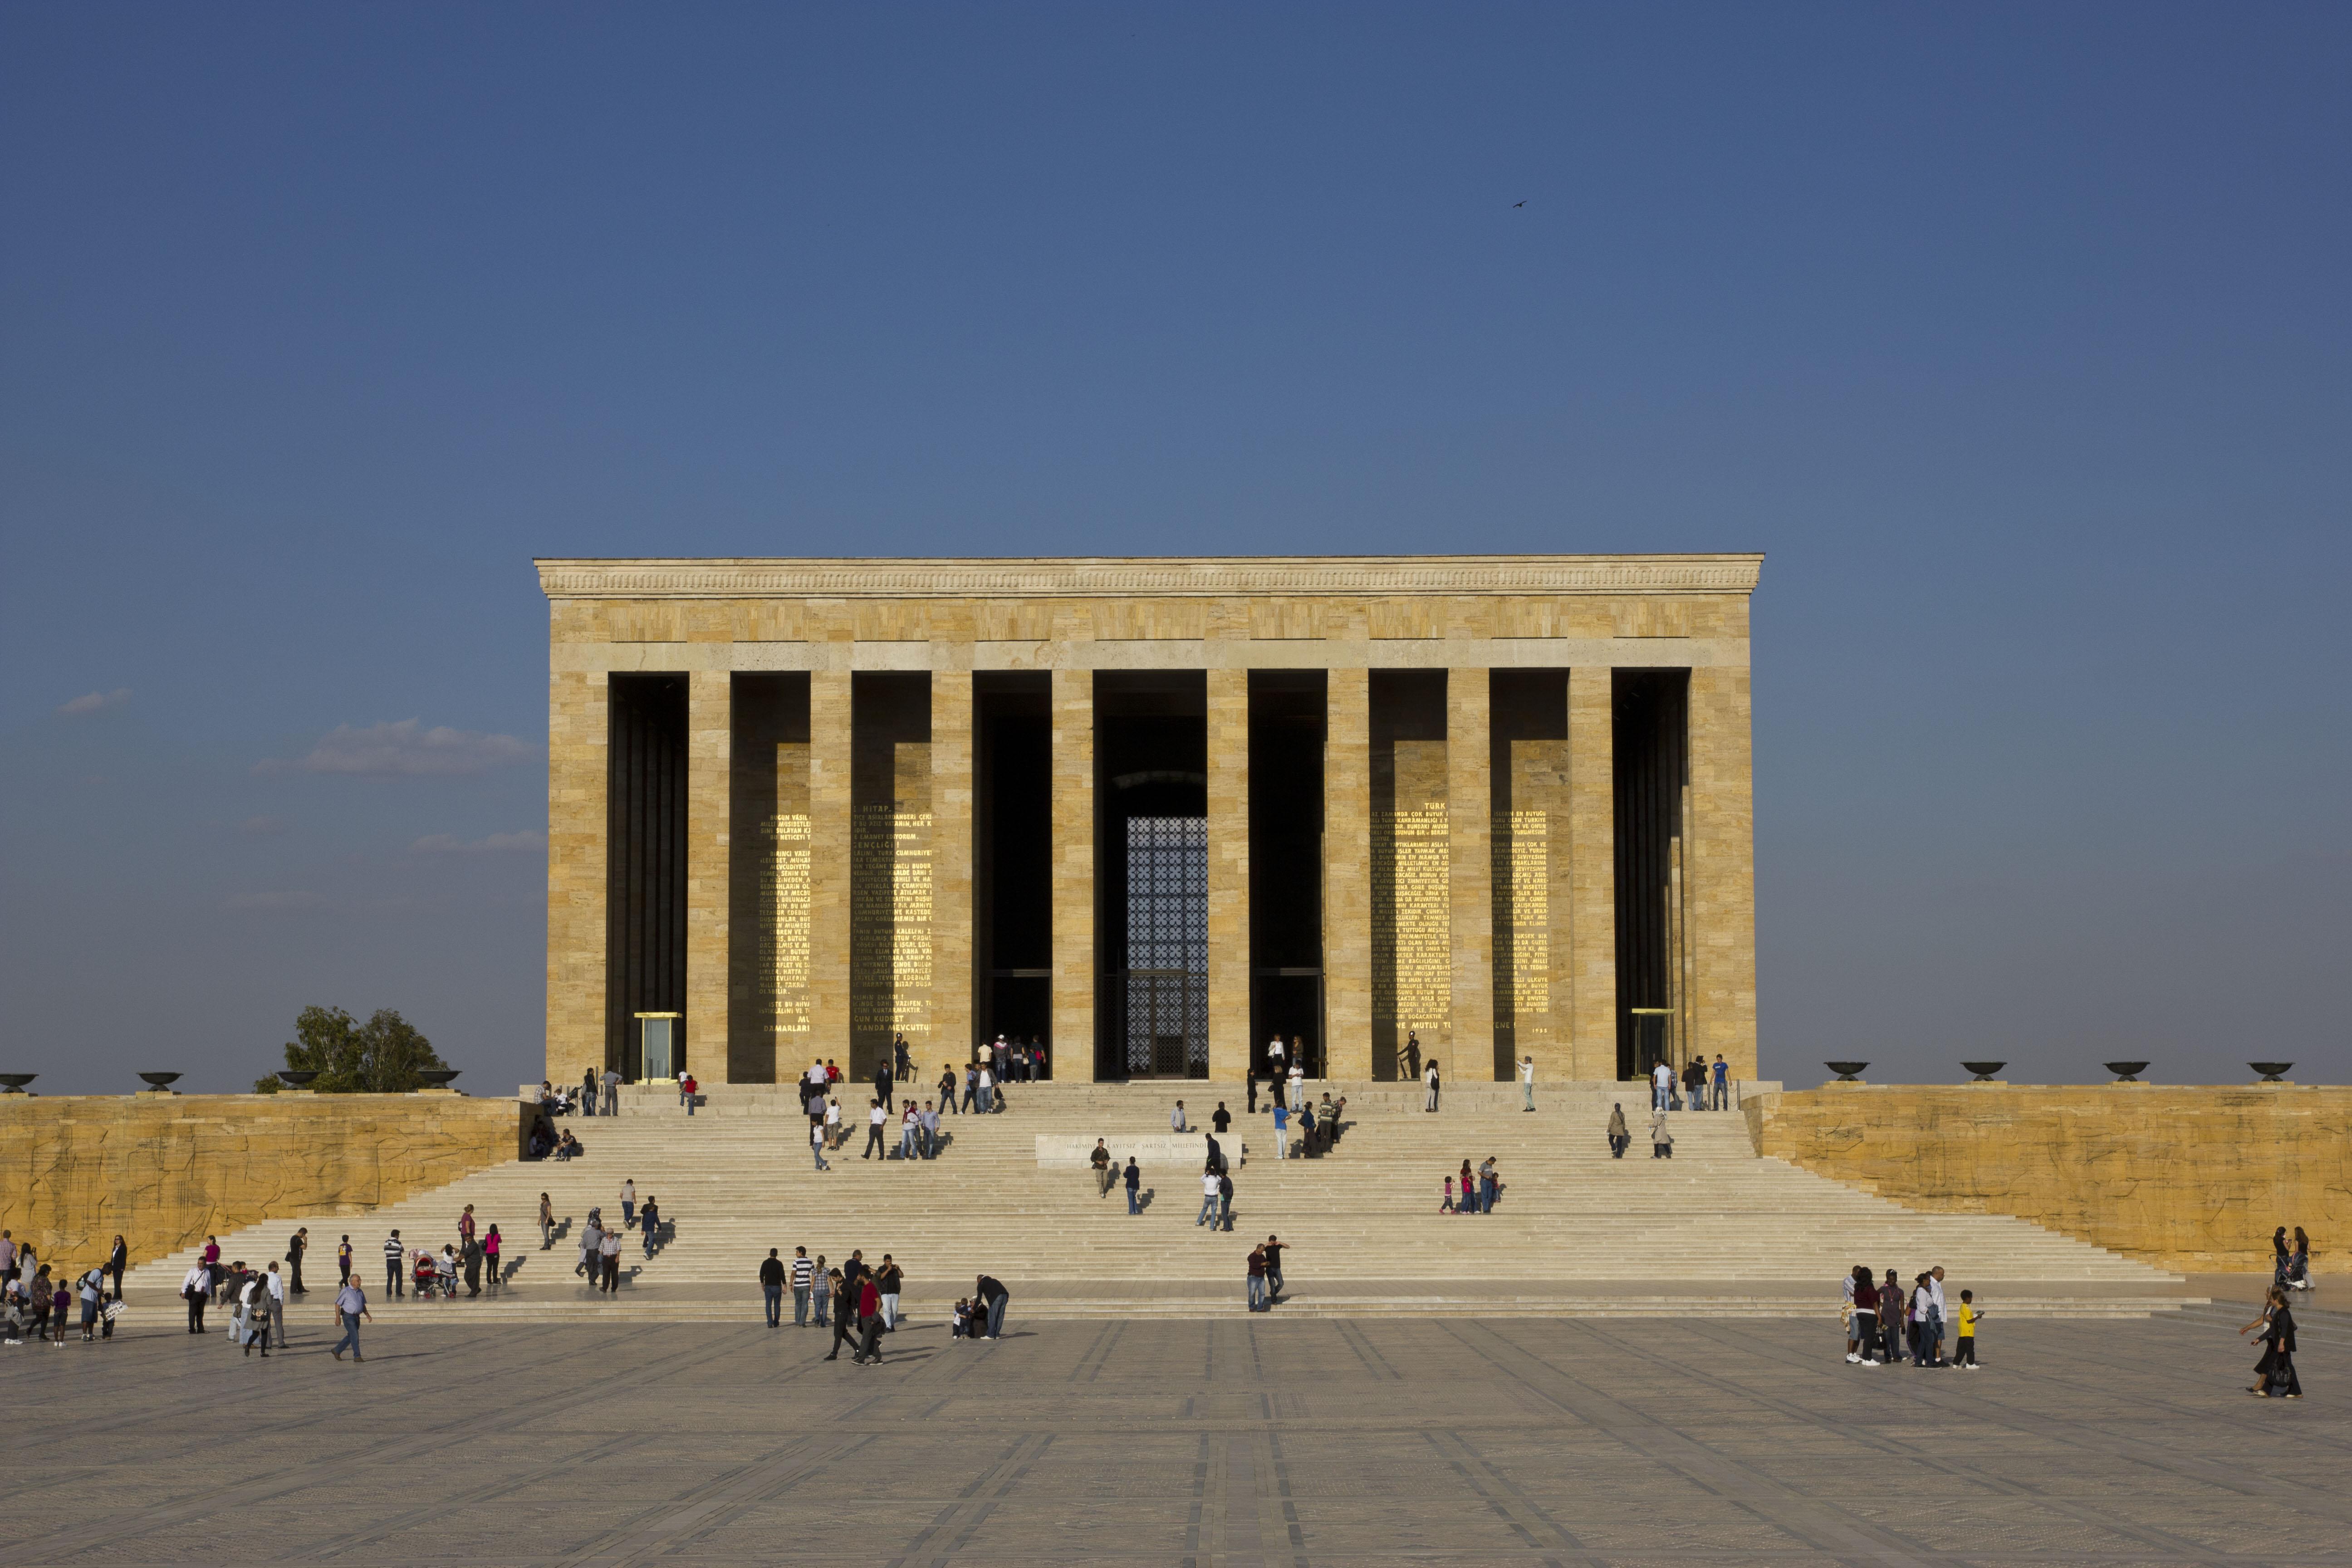 File:Ataturk's Mausoleum (6225341313).jpg - Wikimedia Commons